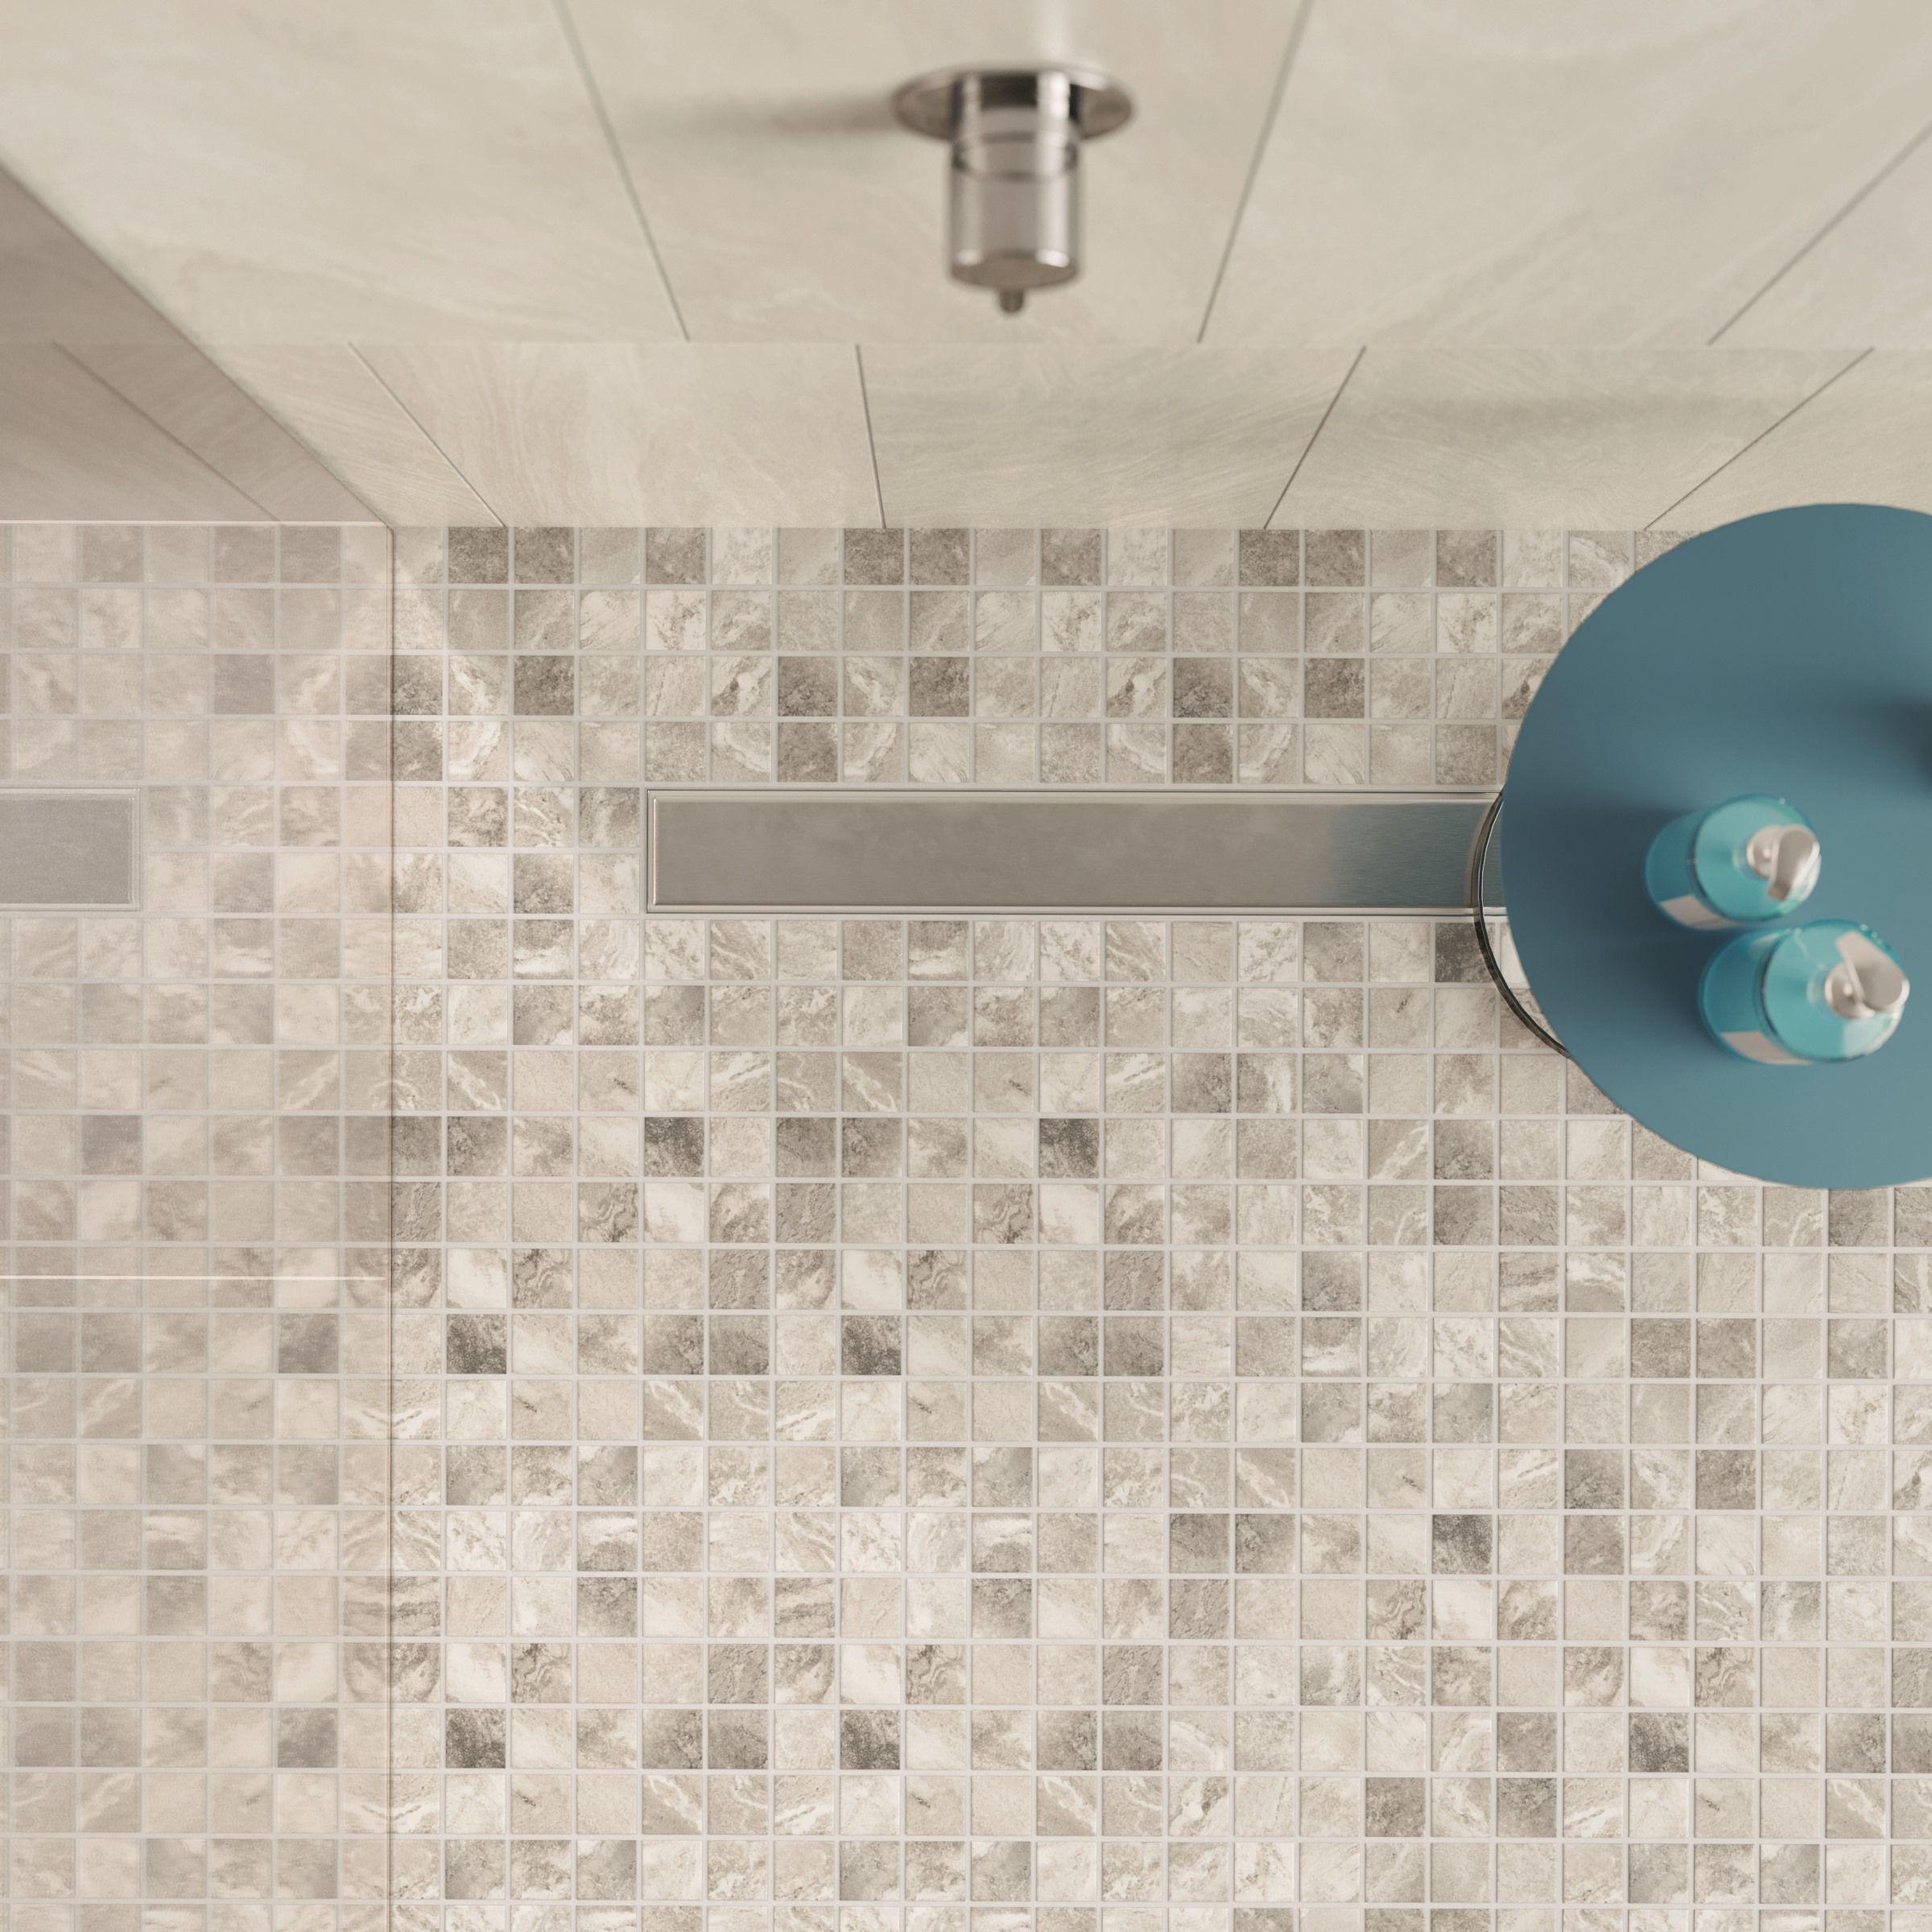 Rutschfestes Mosaik Zum Duschen Mosaik Mosaiklook Mosaikdesign